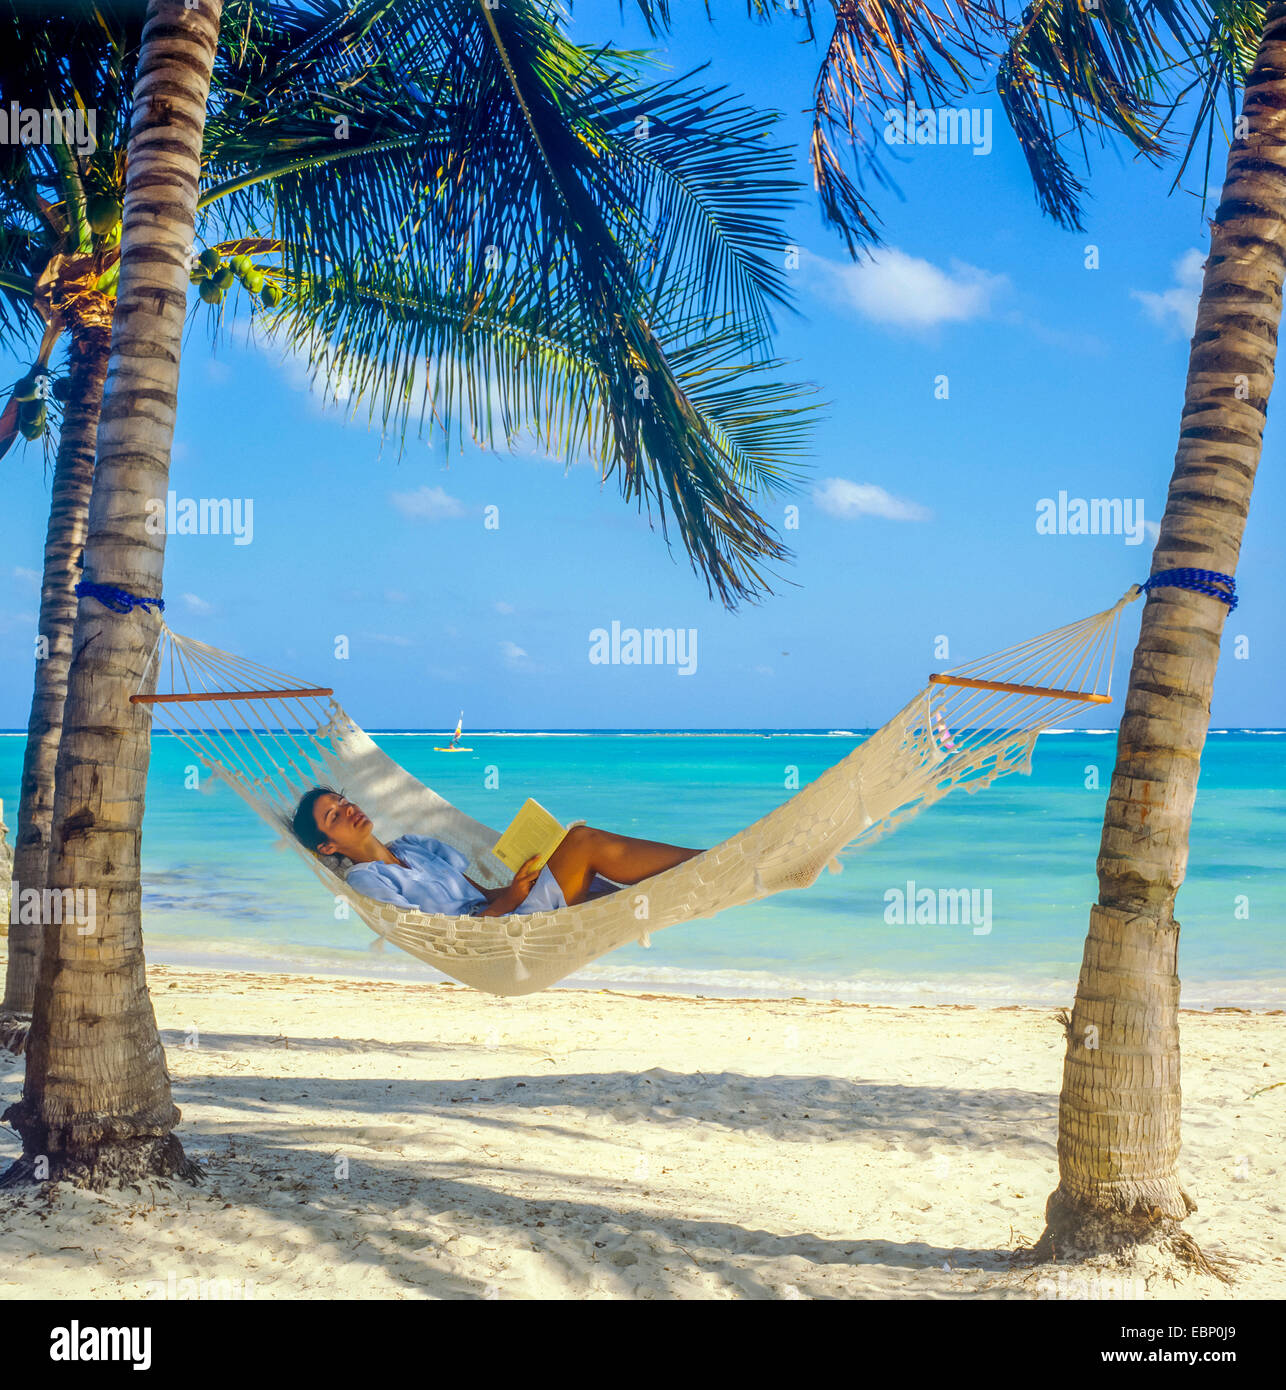 Young Woman Sleeping In Hammock Between Palm Trees On